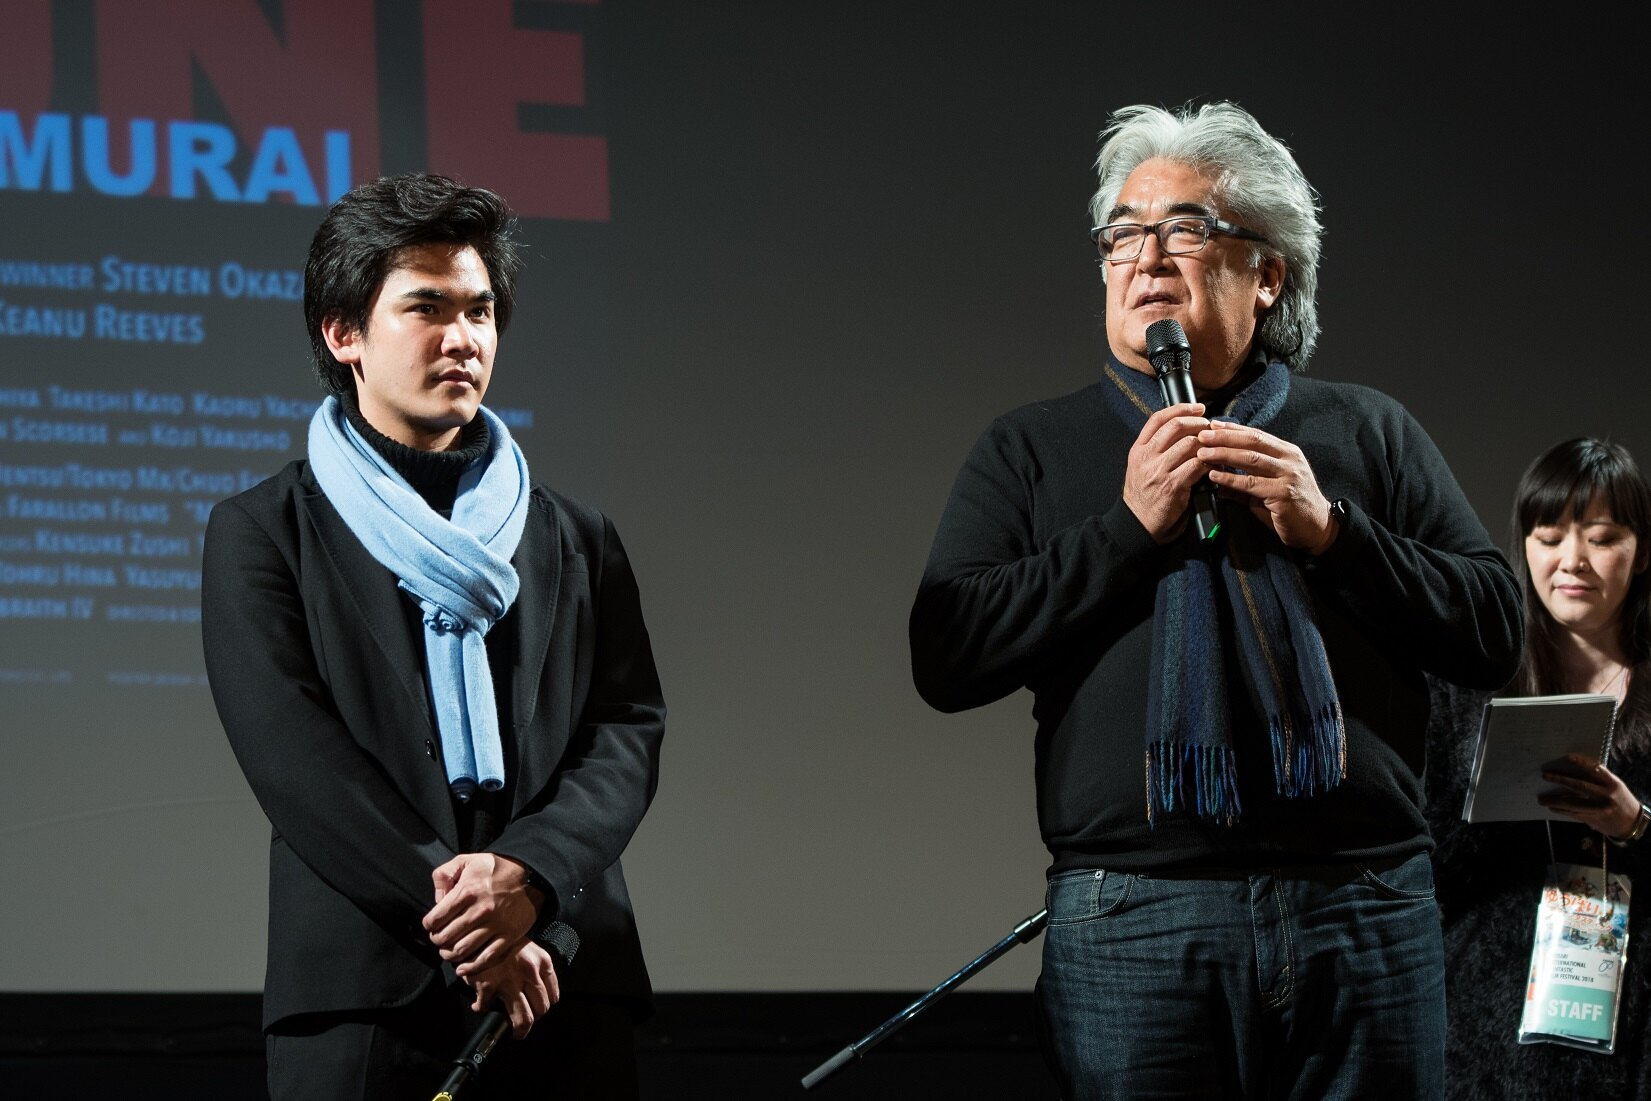 『MIFUNE:THE LAST SAMURAI』の三船力也プロデューサー(左)と、スティーブン・オカザキ監督(右)